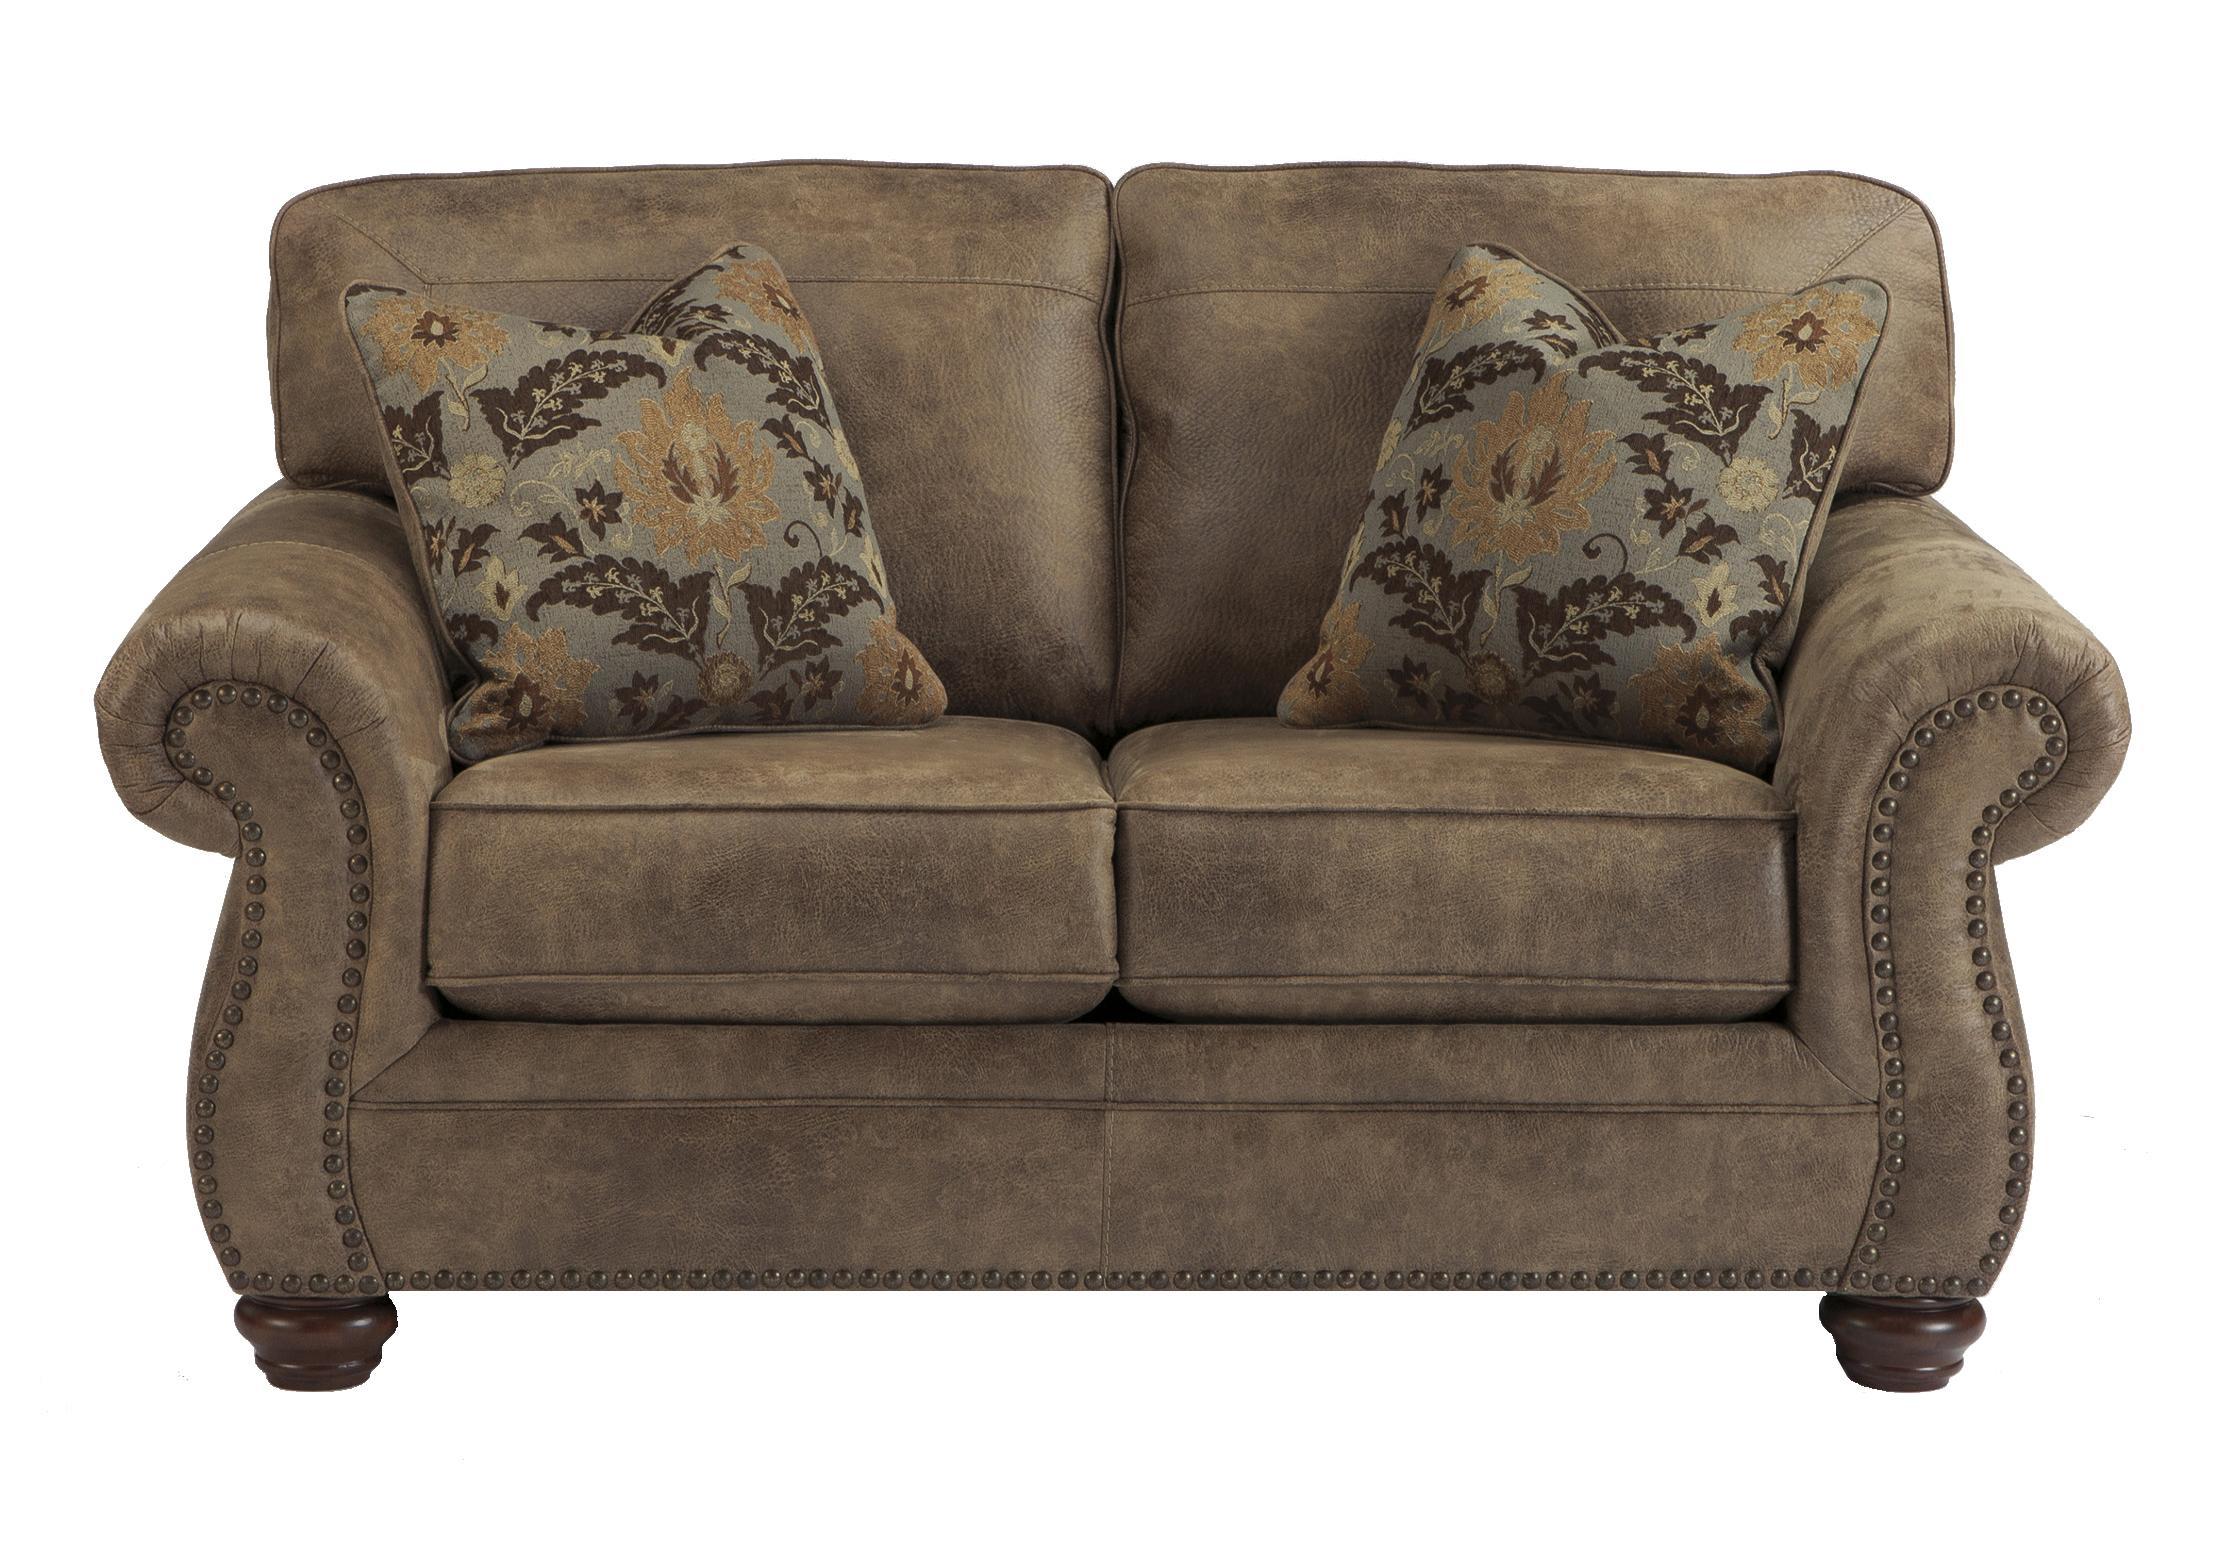 Signature design by ashley larkinhurst earth 3190135 for Ashley furniture appleton